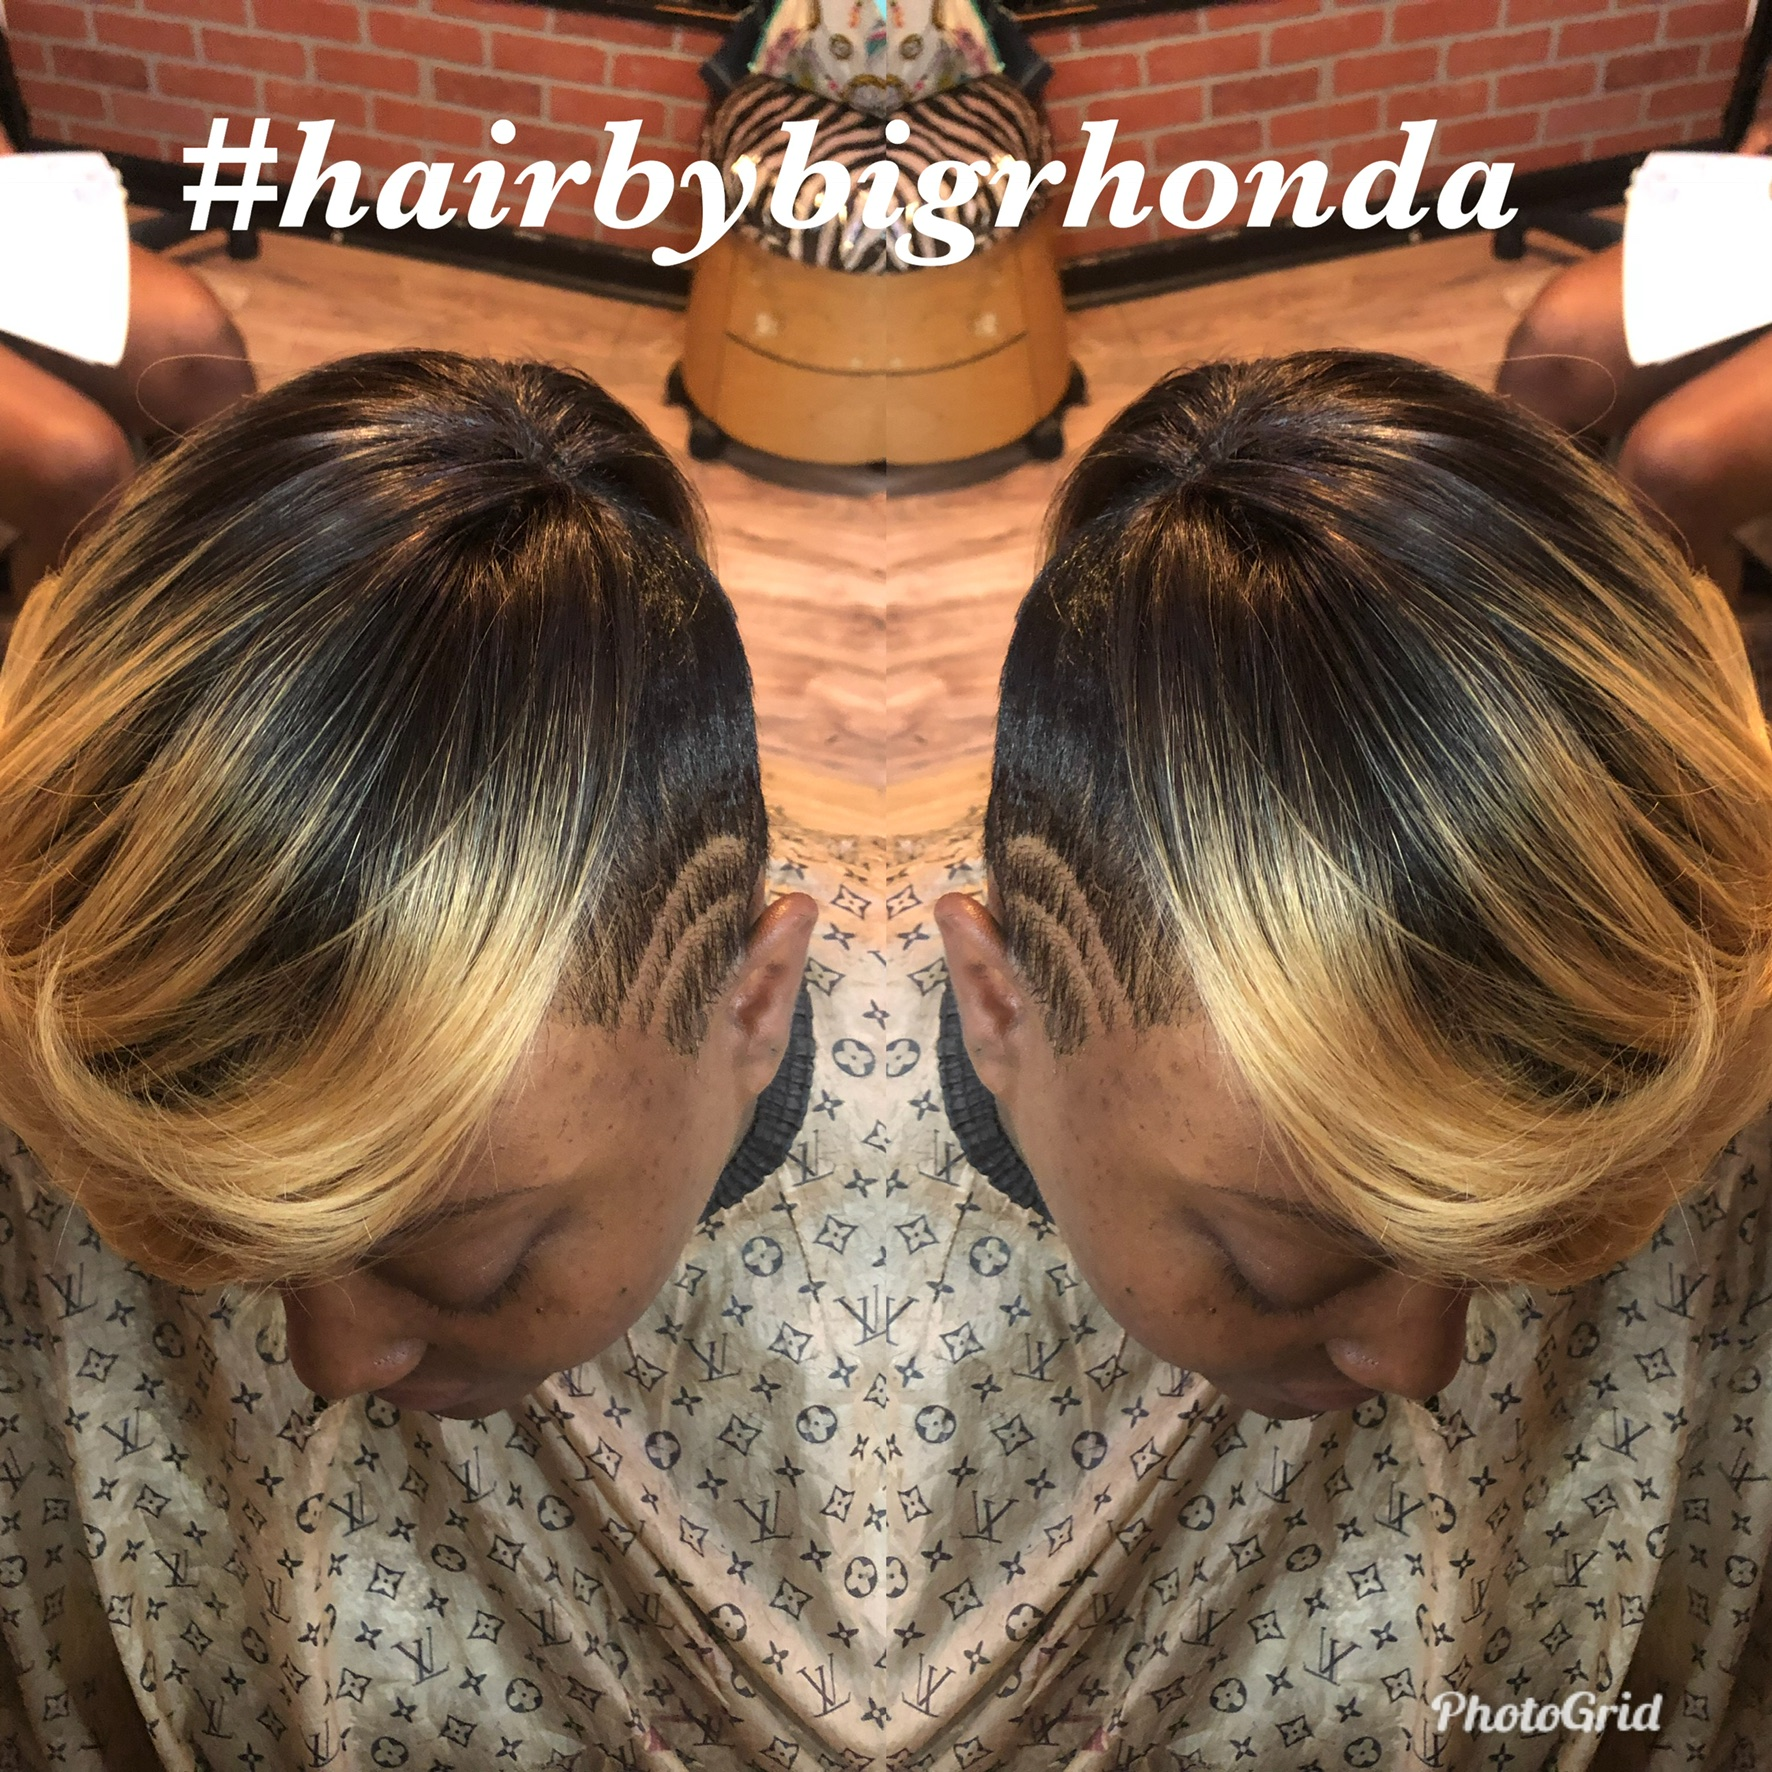 Hair By Big Rhonda in New York, NY // Fash